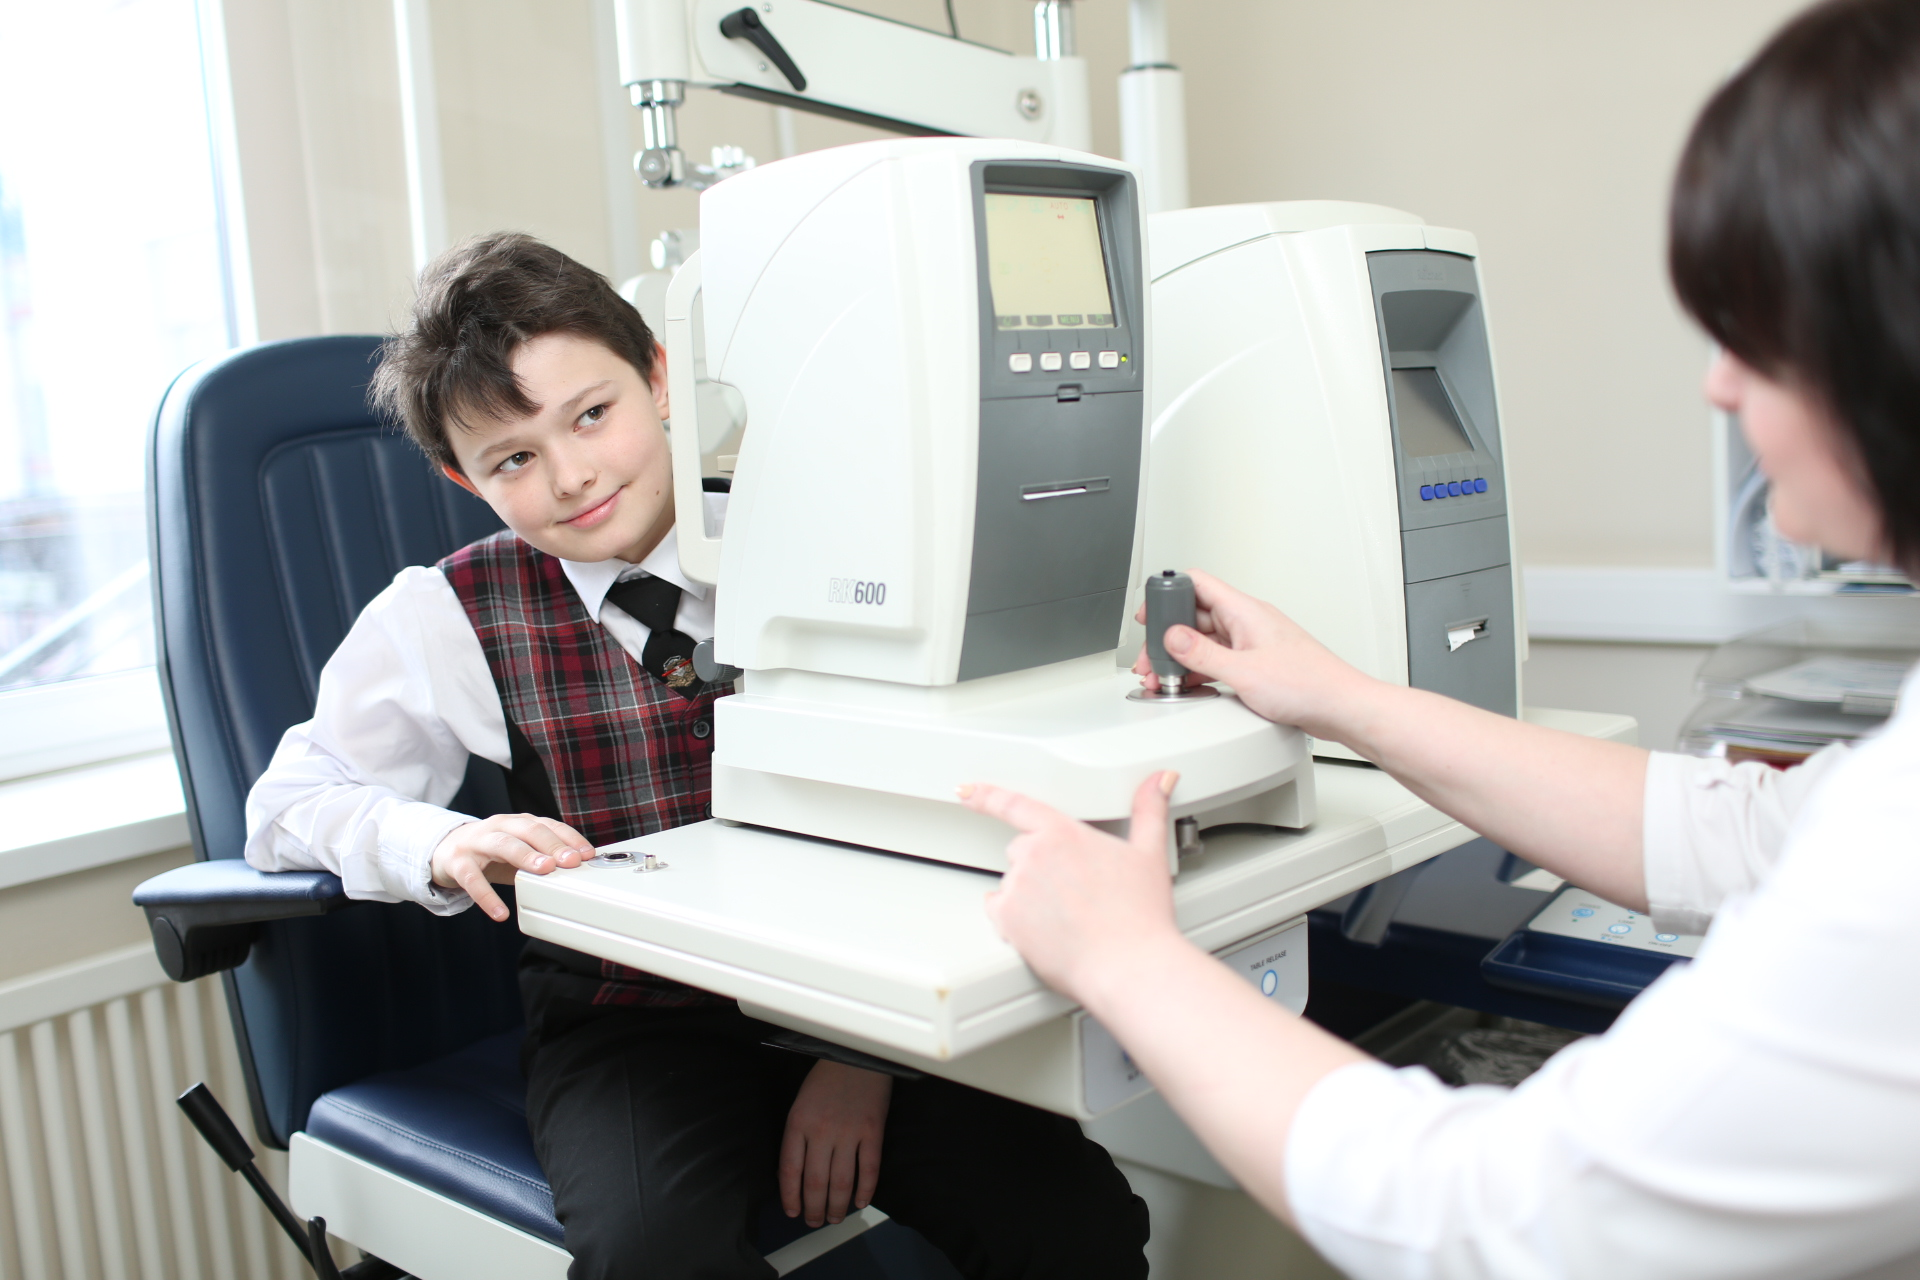 к врачу-офтальмологу